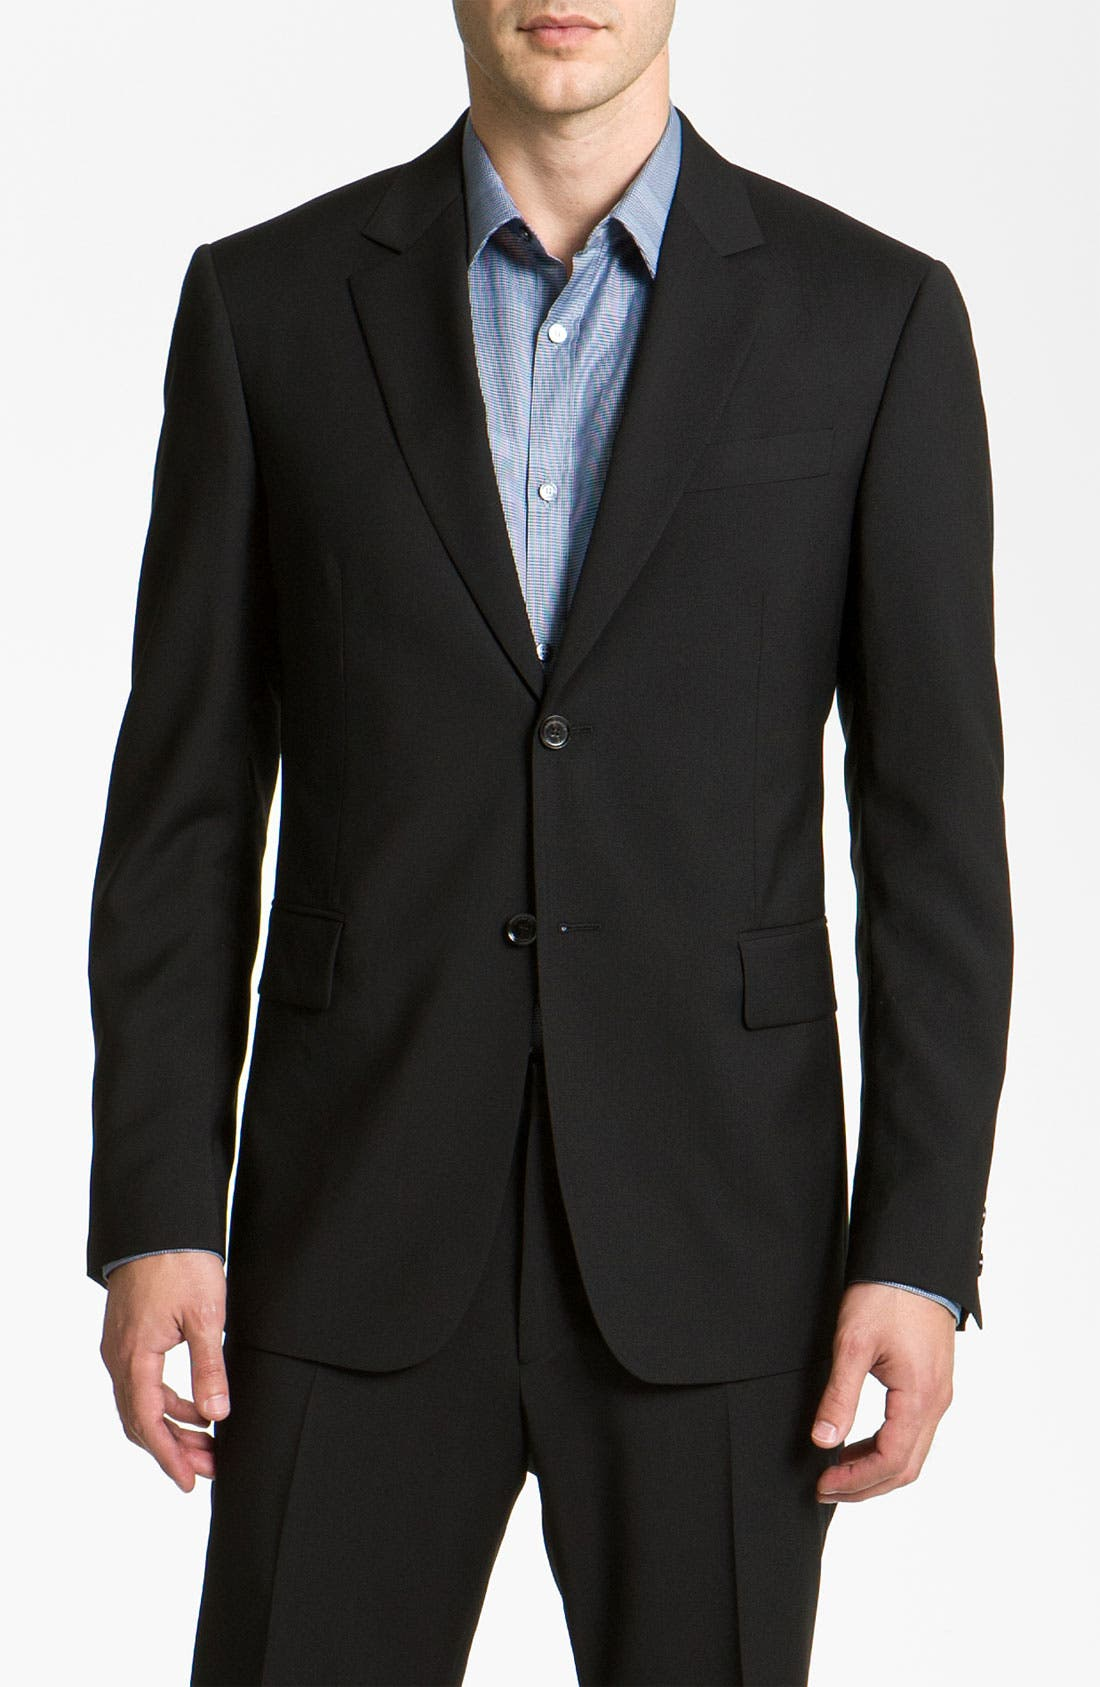 Main Image - Burberry Trim Fit Wool Suit